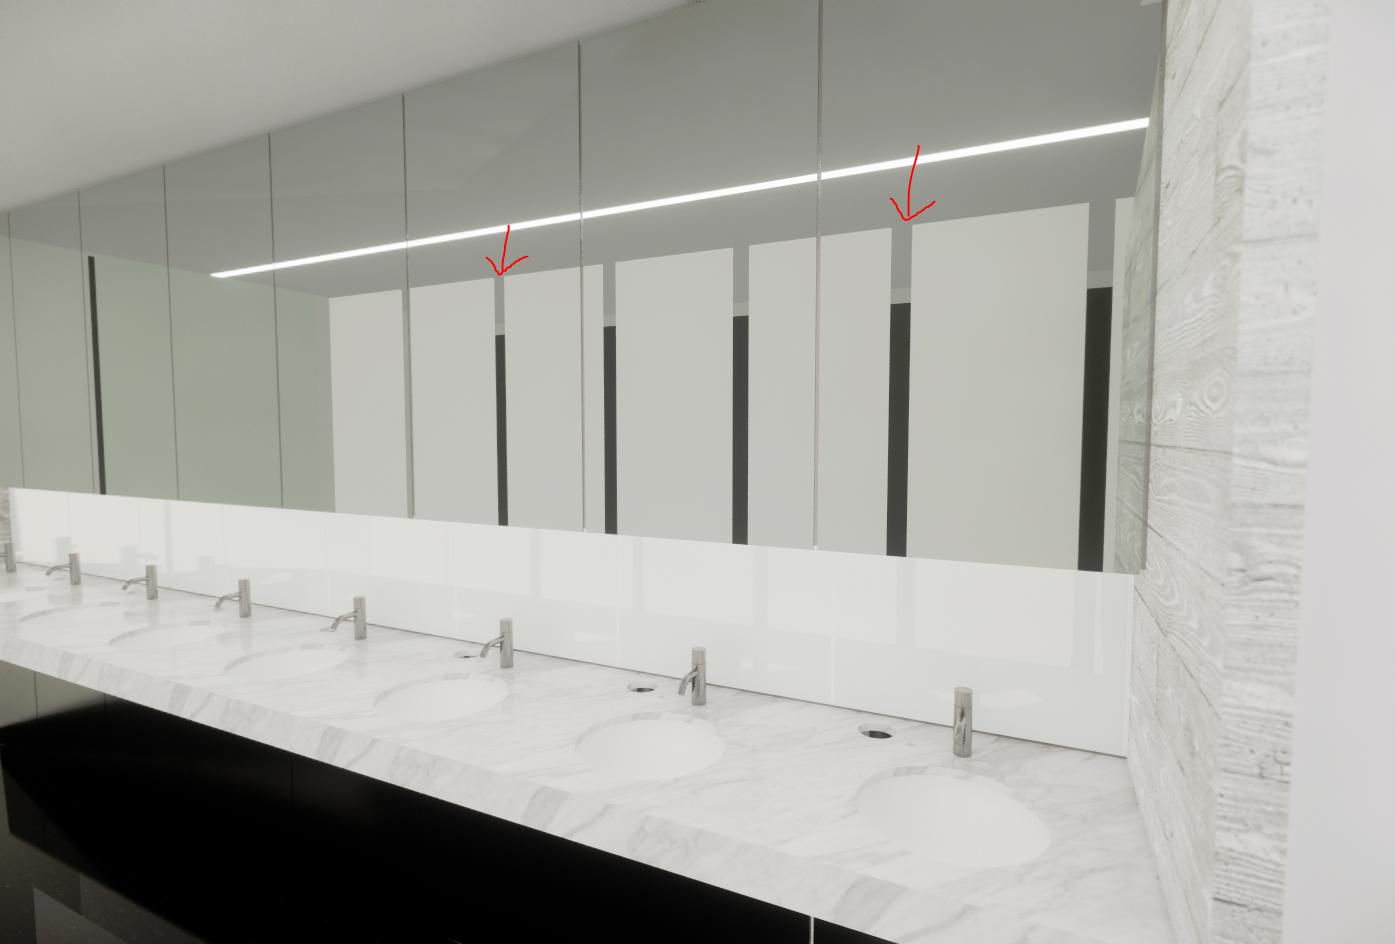 Missing Items in Mirror Reflection - Revit - Enscape Community Forum